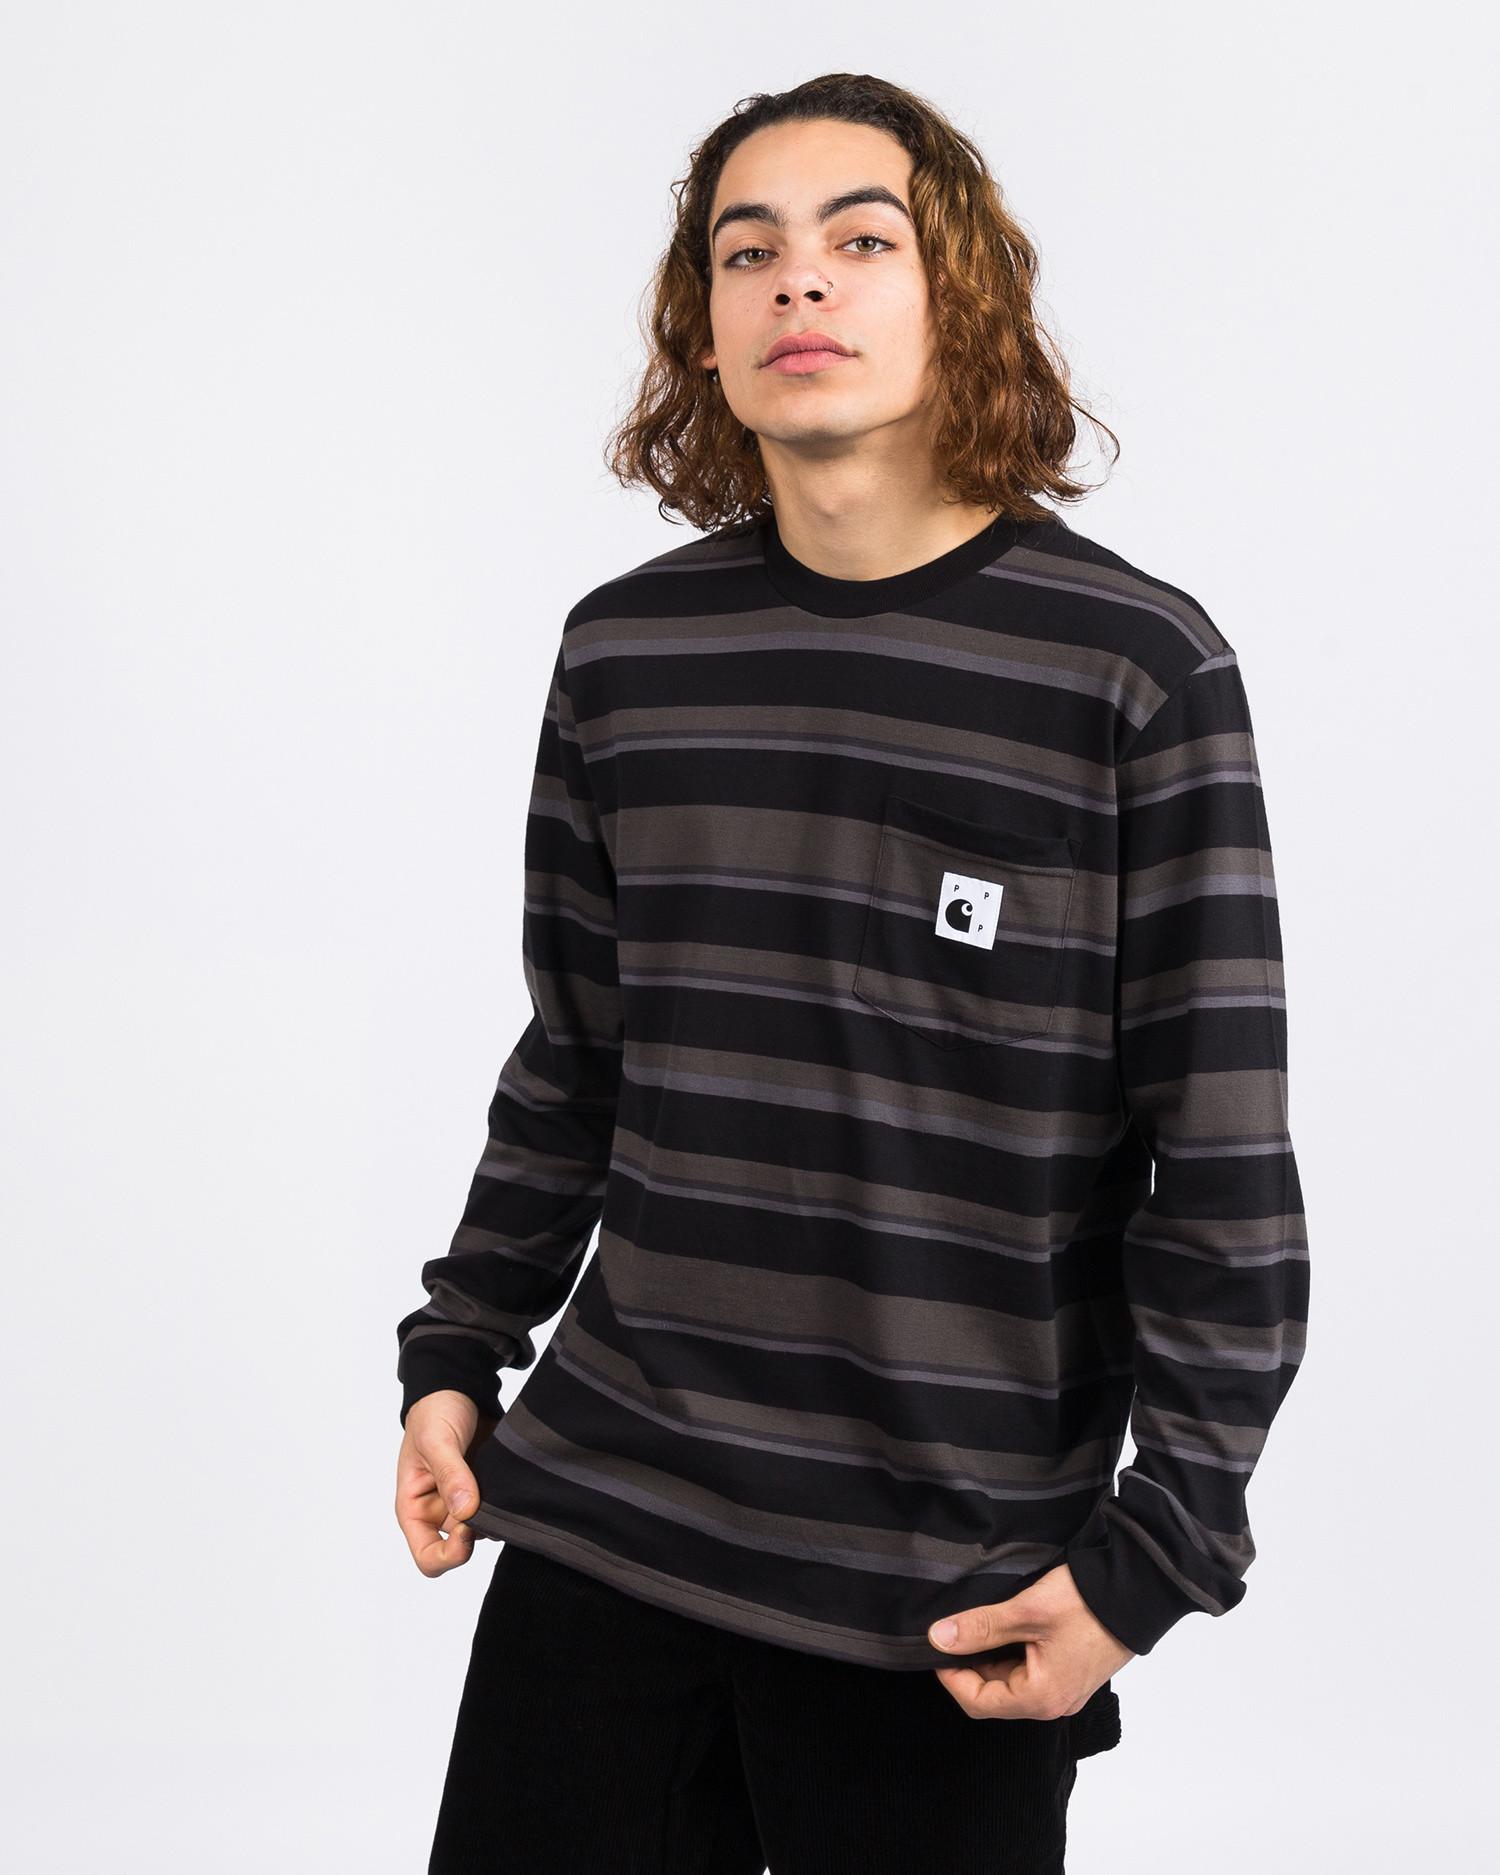 Carhartt x Pop Trading Co Longsleeve Pocket T-Shirt Black